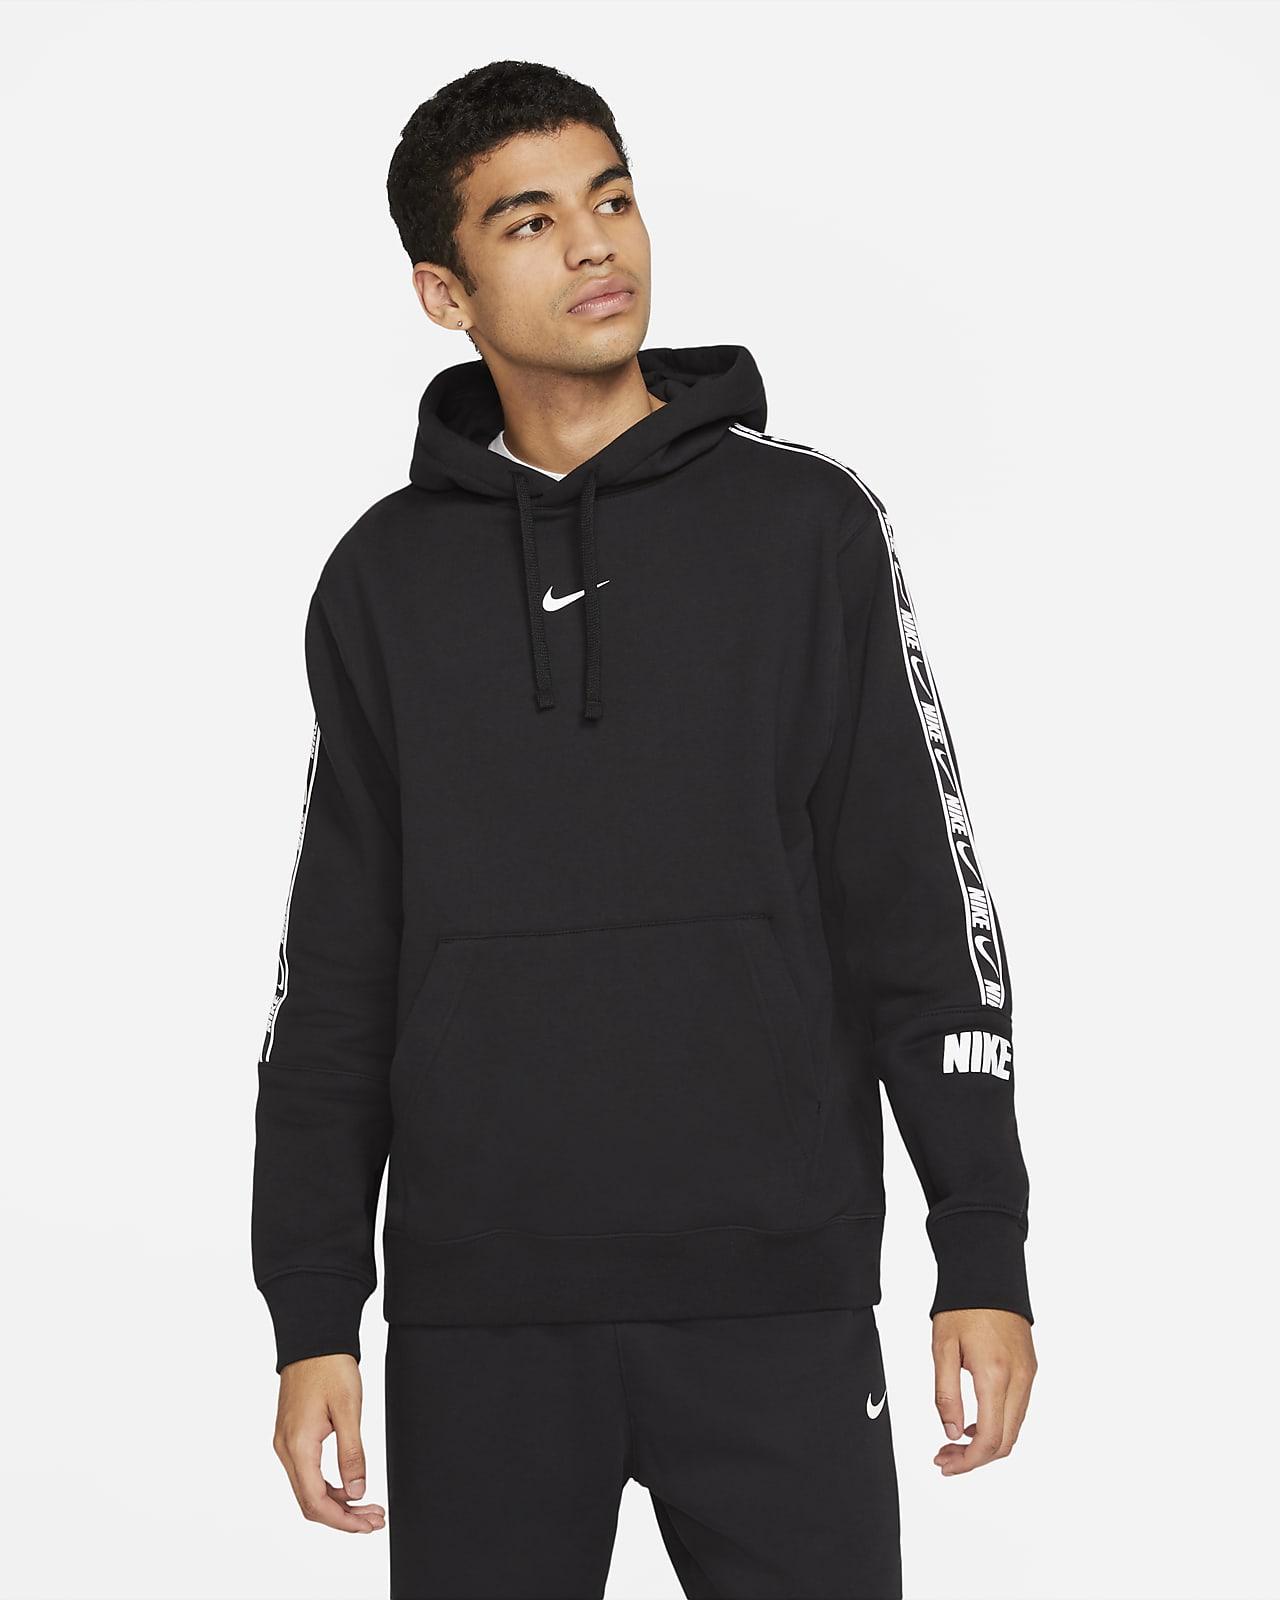 Nike Sportswear kapucnis, belebújós polár férfipulóver